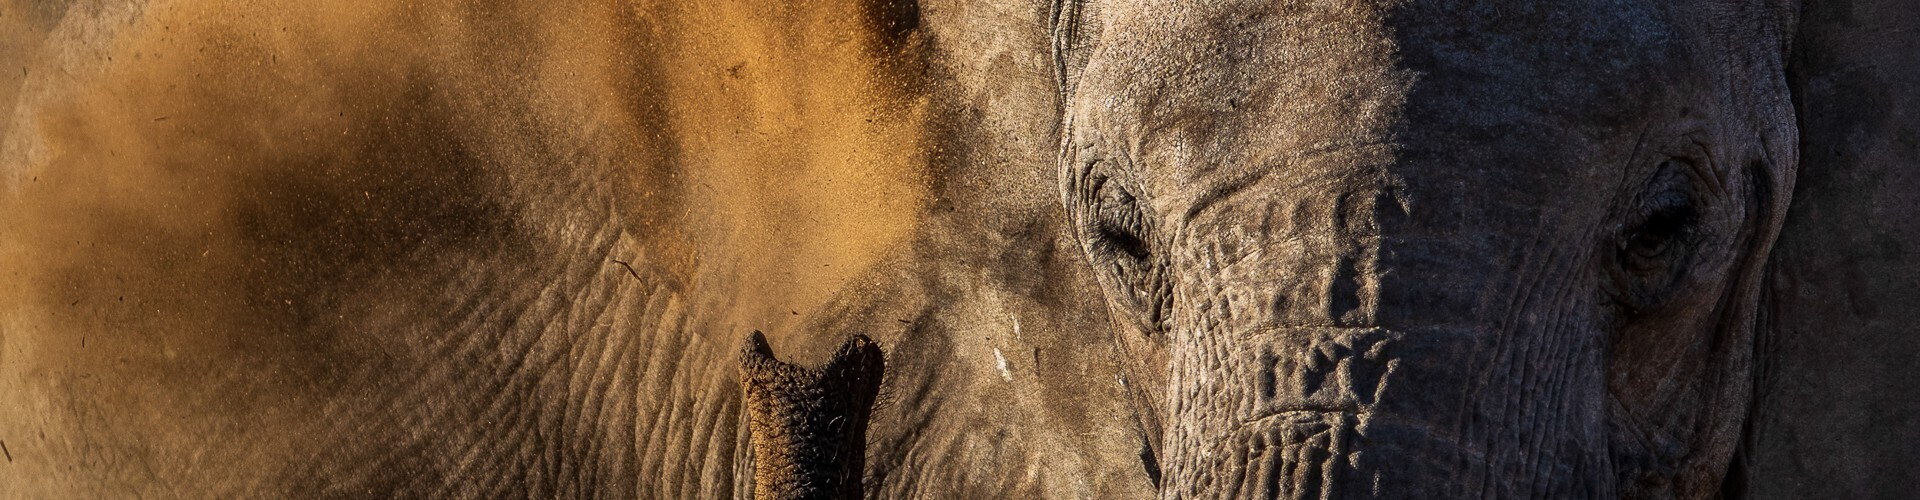 voyage photo safari animalier mathieu pujol header